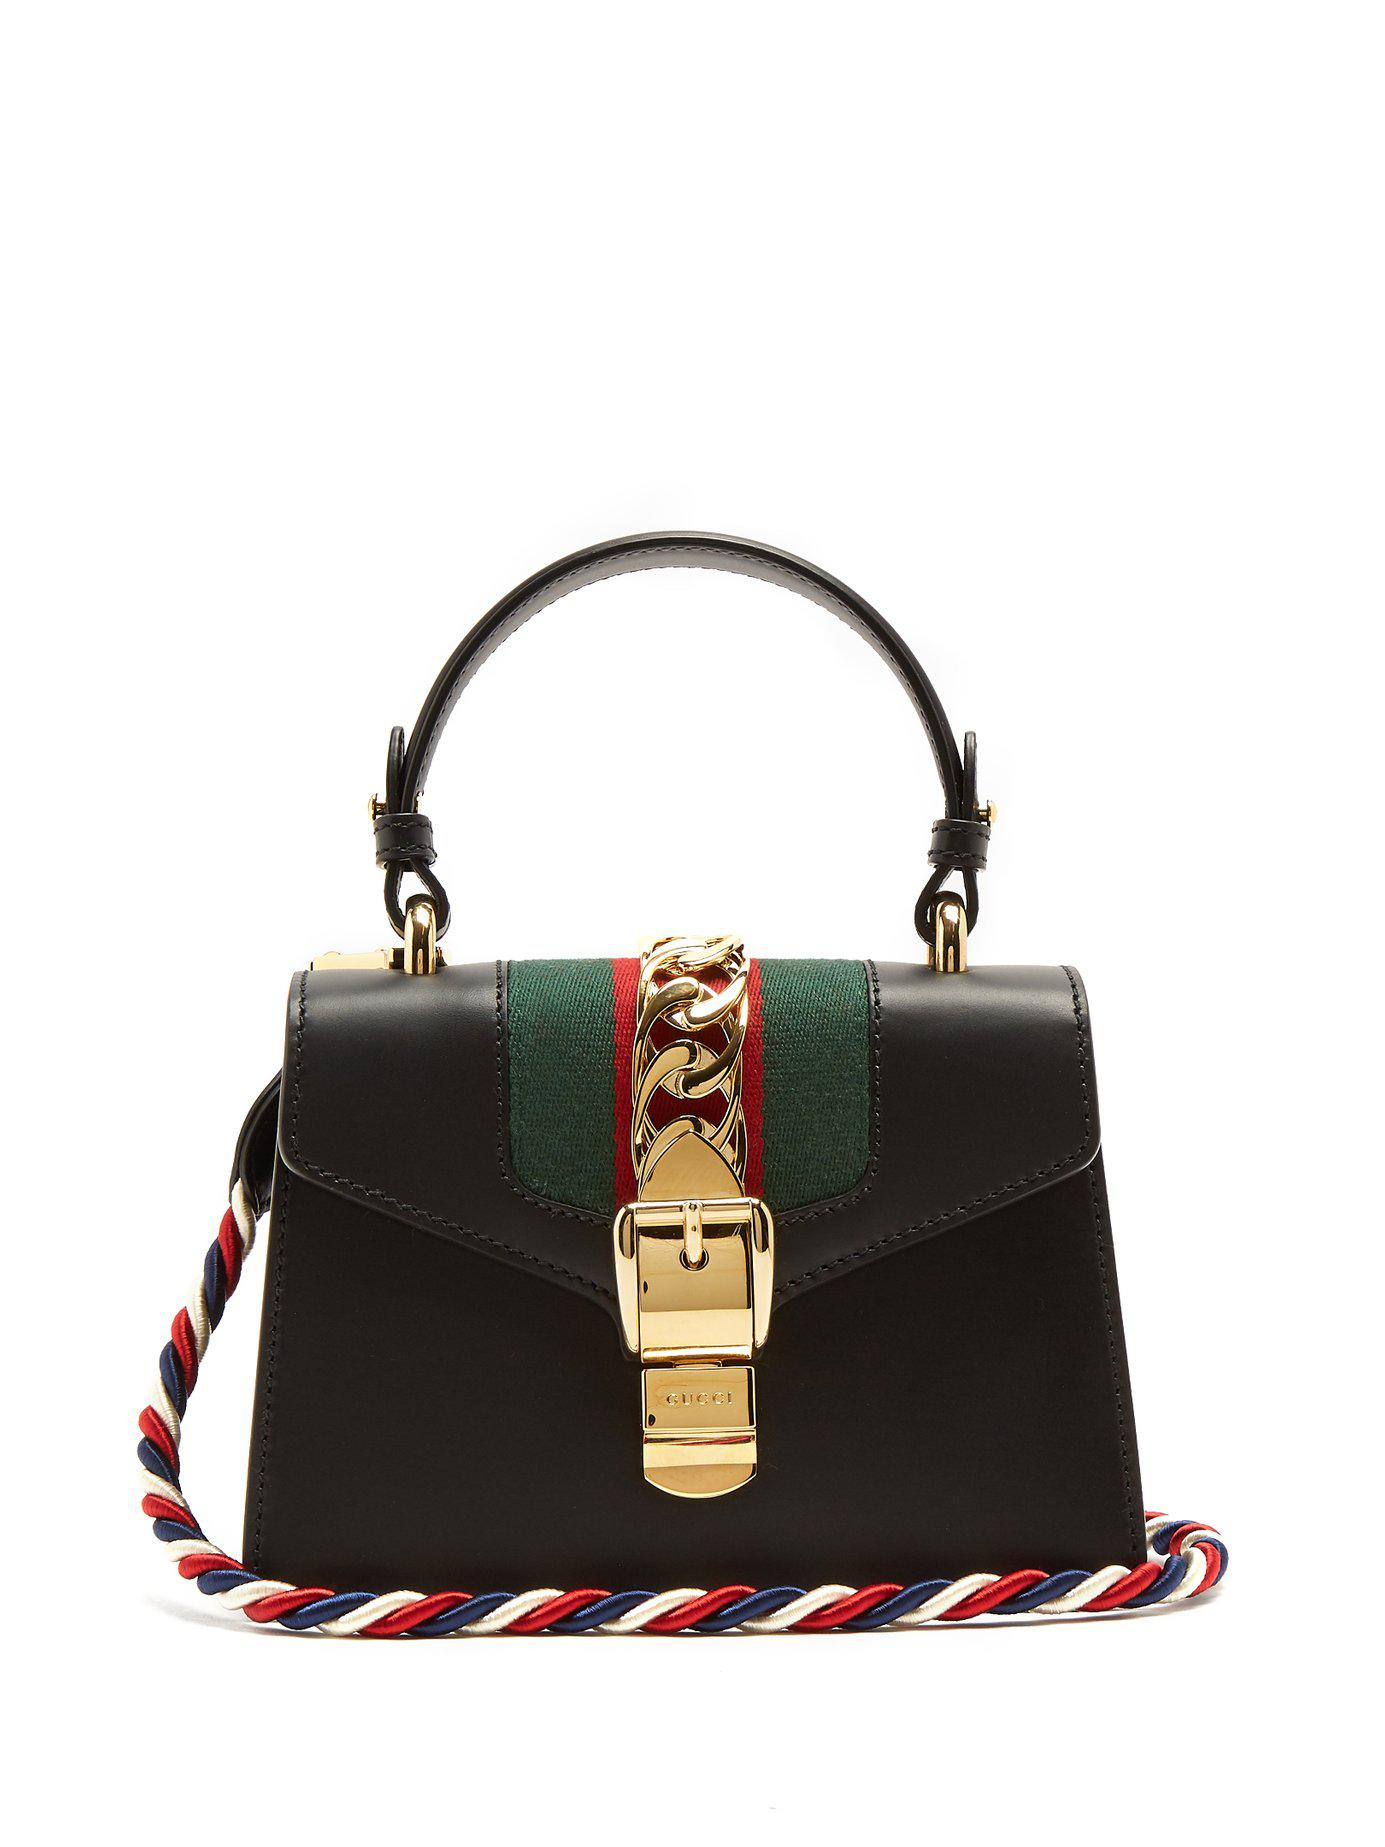 6c44b453e8a Lyst - Gucci Sylvie Mini Leather Cross Body Bag in Black